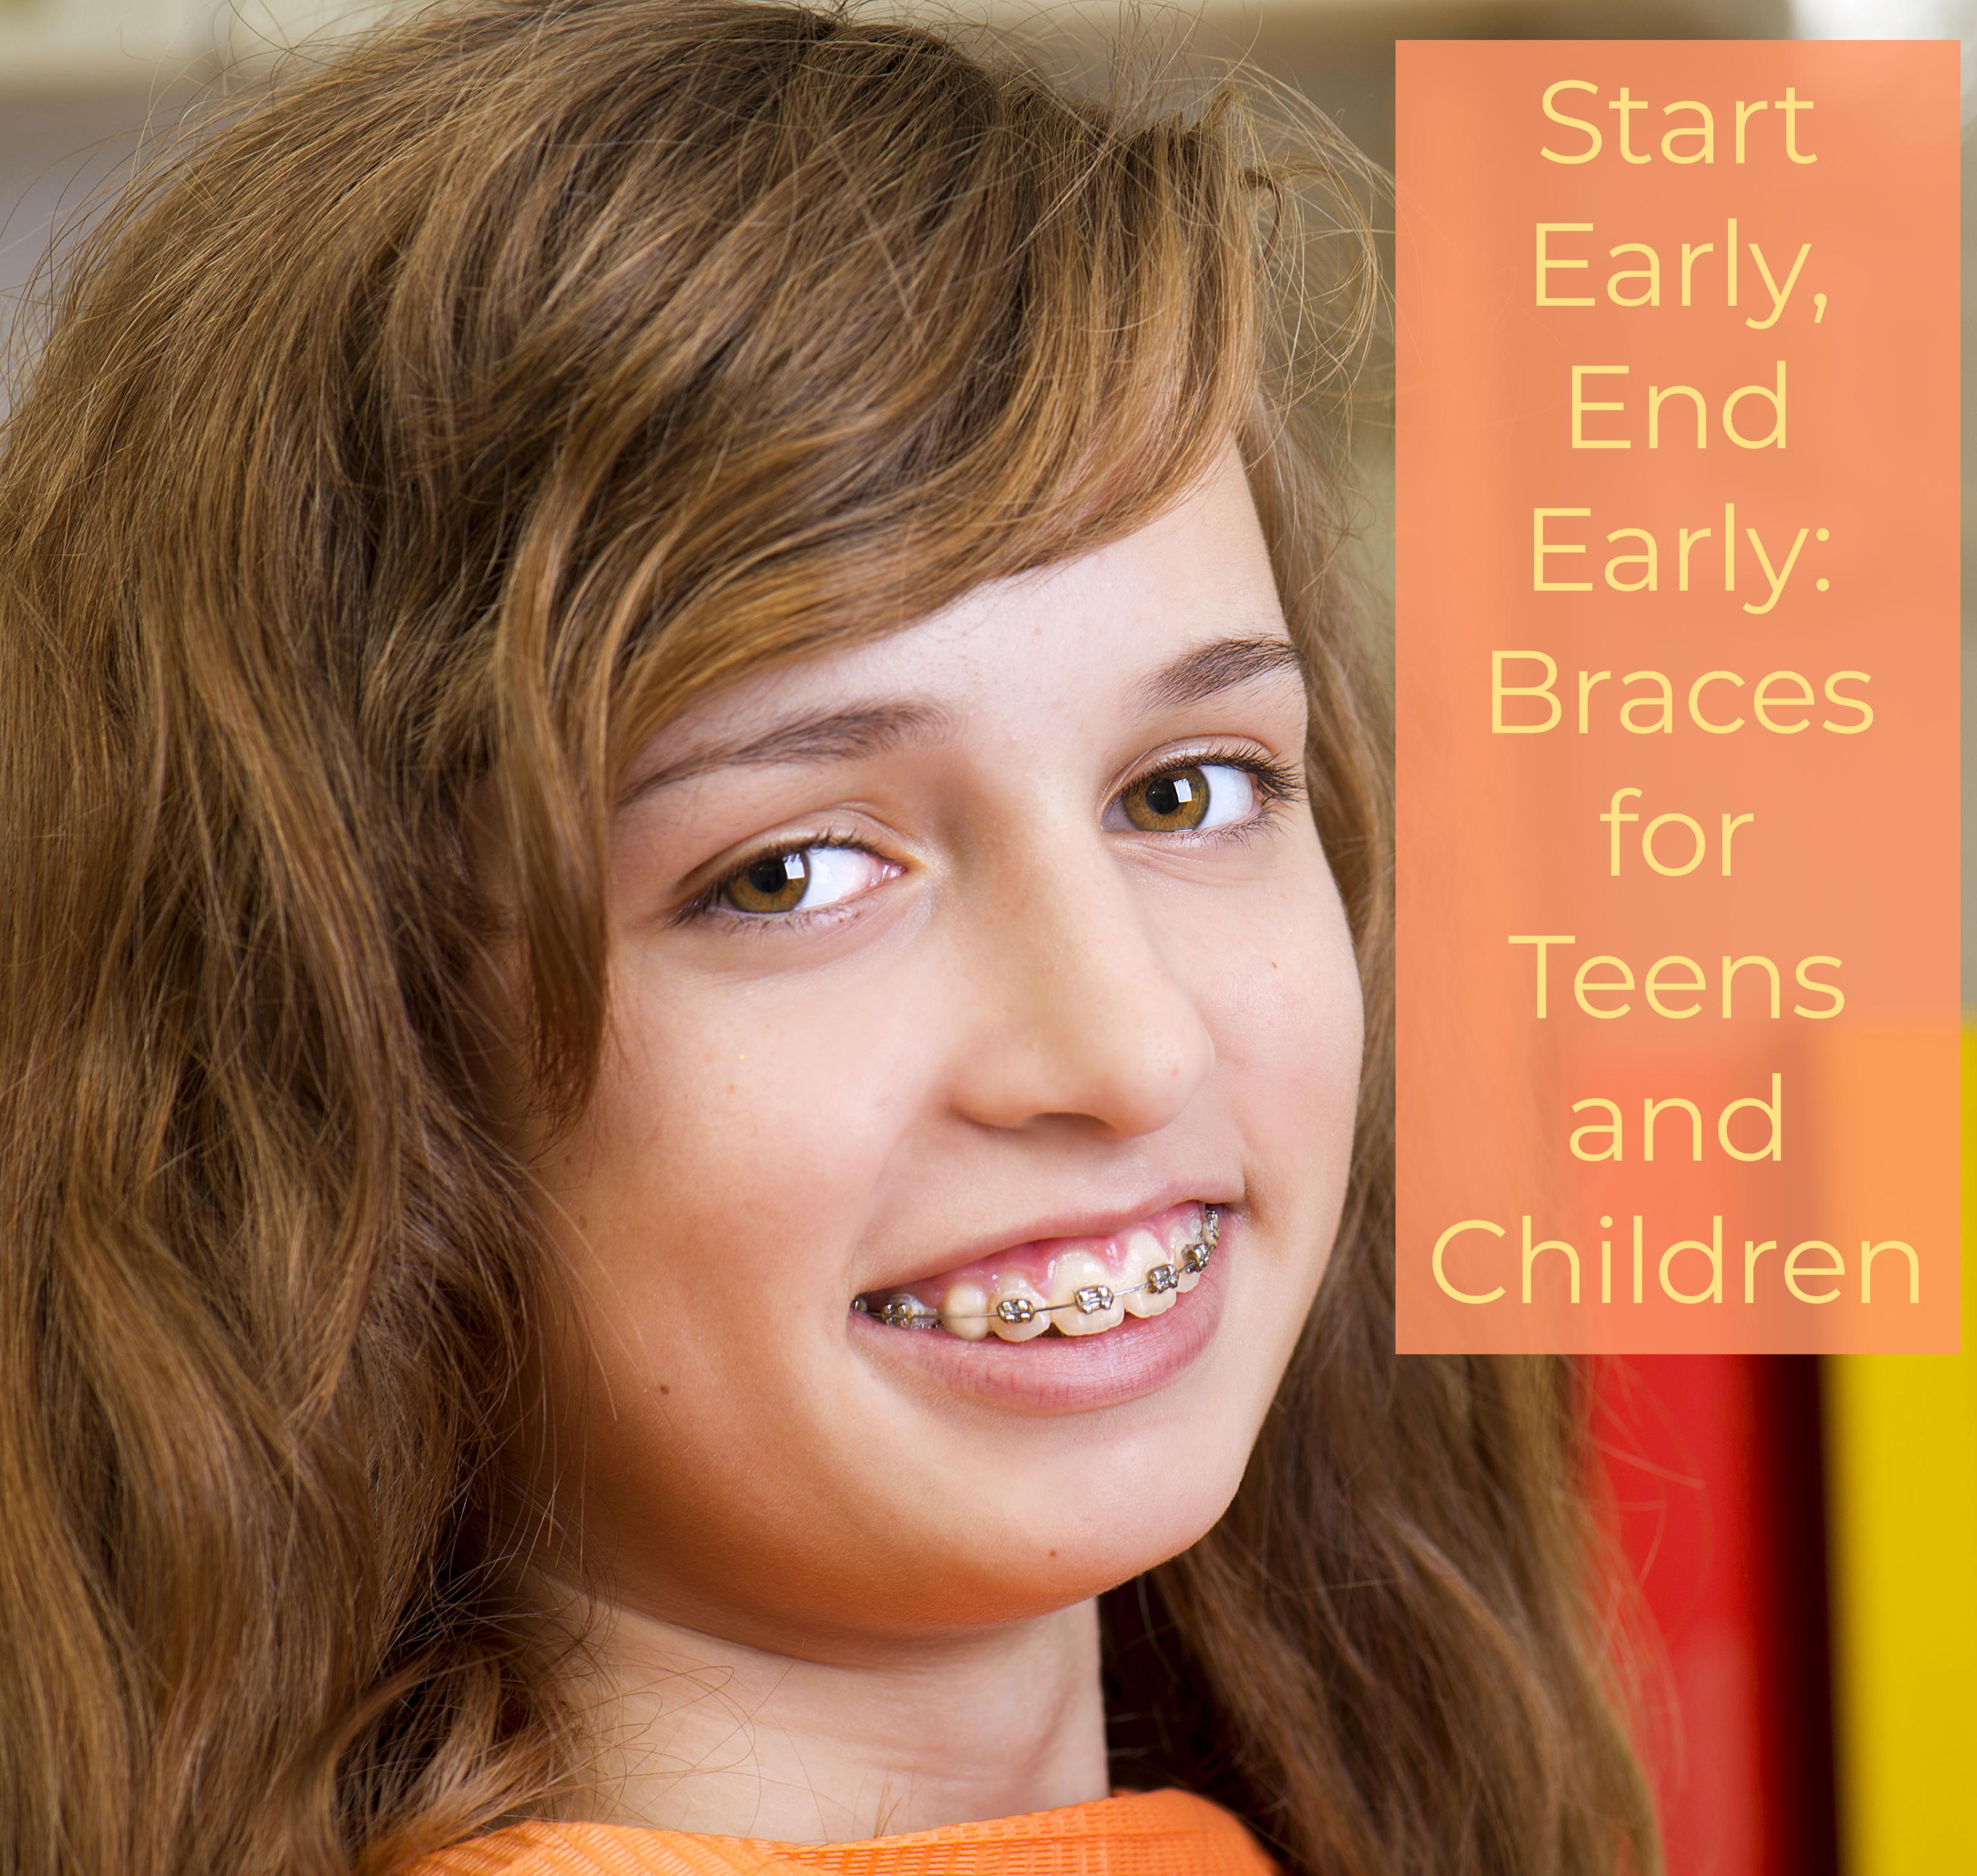 braces for straight teeth